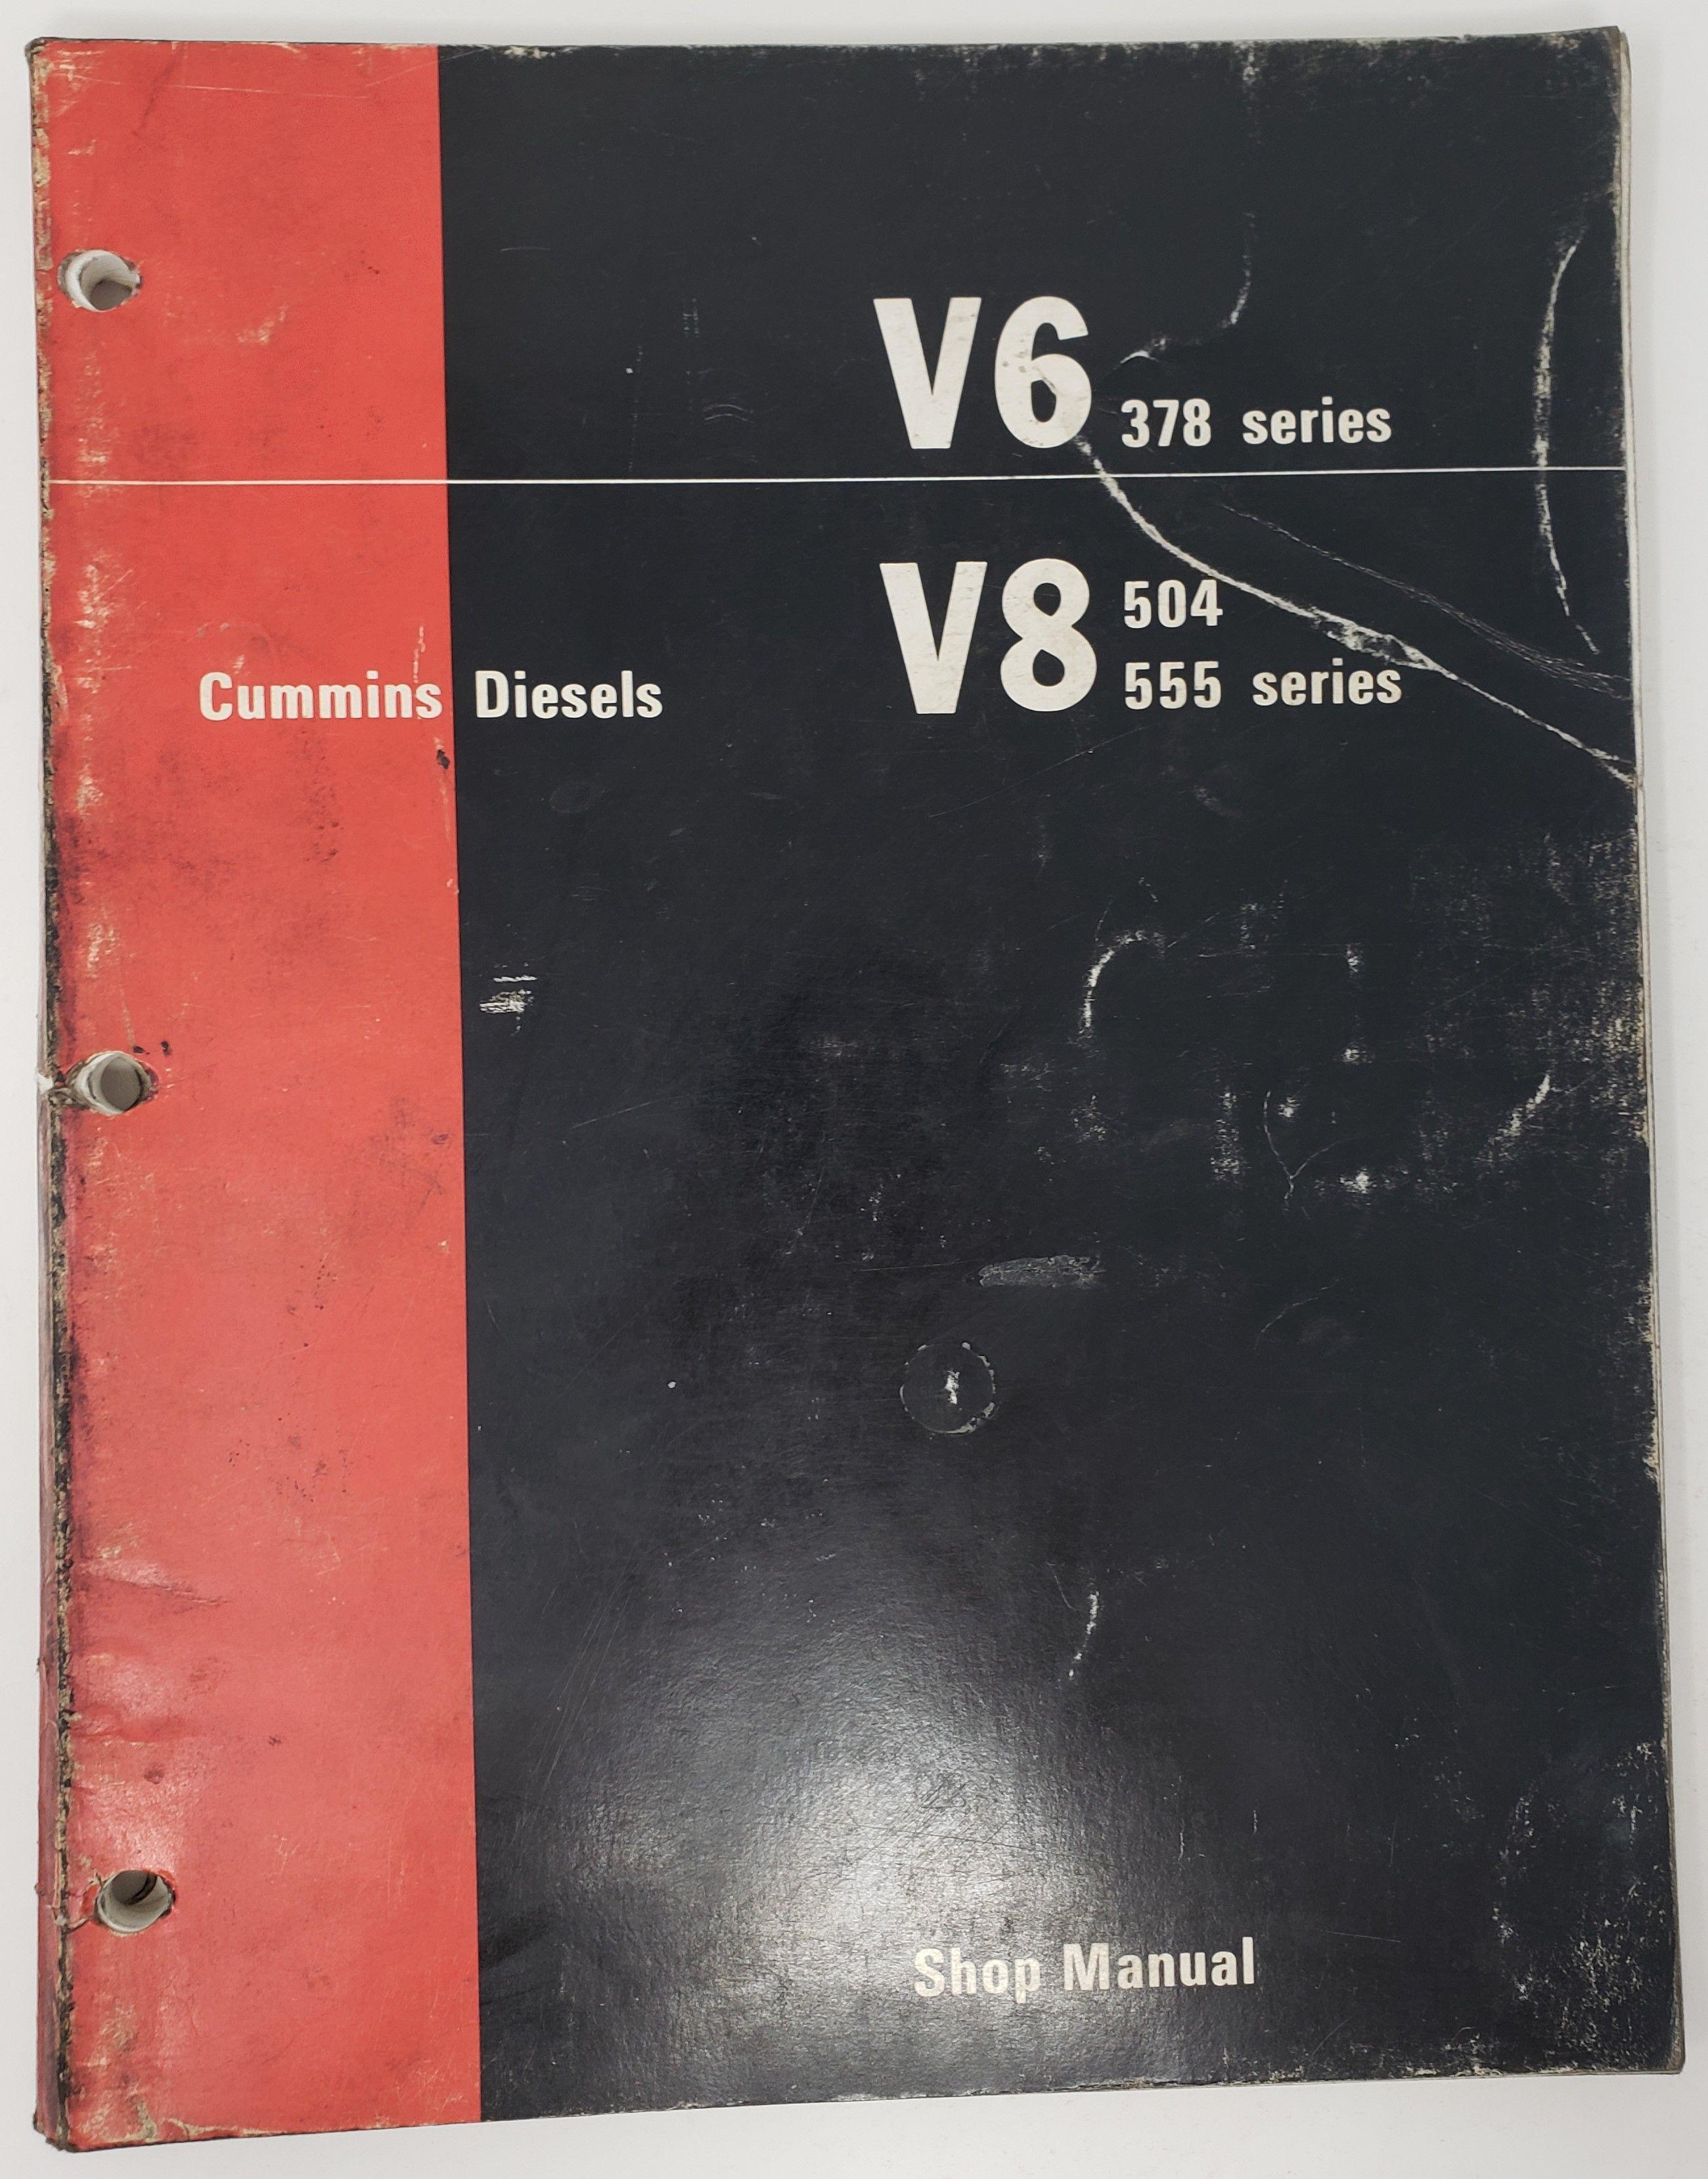 1973 Cummins Diesels V6 378 Series V8 504 555 Series Shop Manual 983723 Oe Cummins Diesel Cummins Diesel